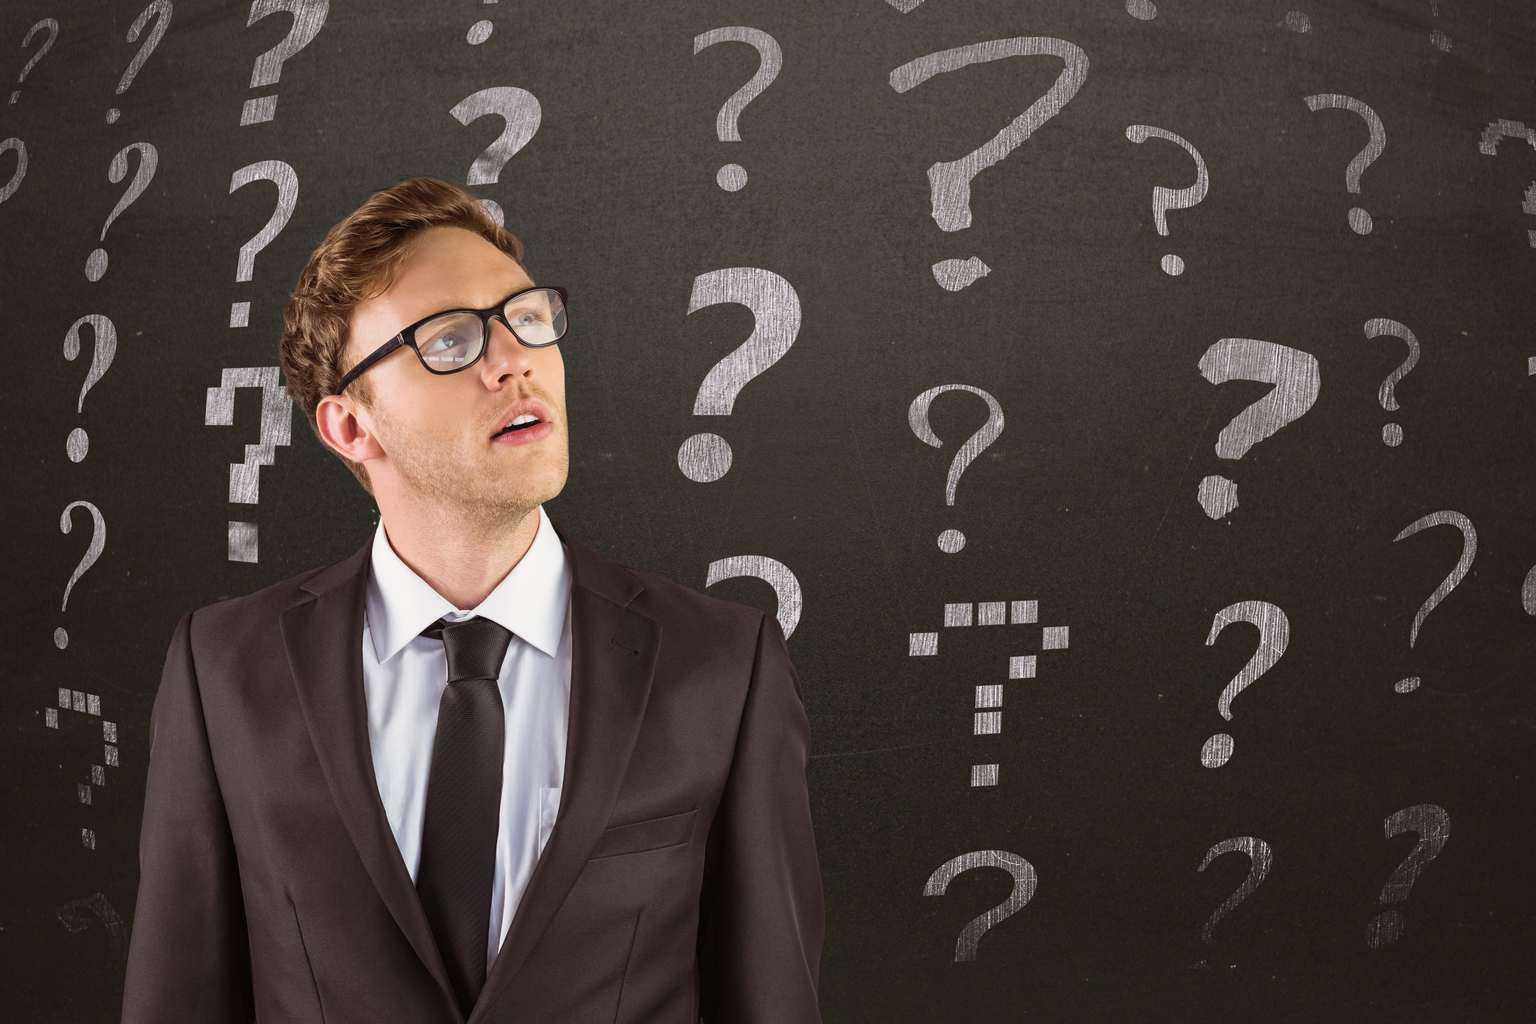 【Q&A】就活エクスプレスの気になる疑問点を全て解決!